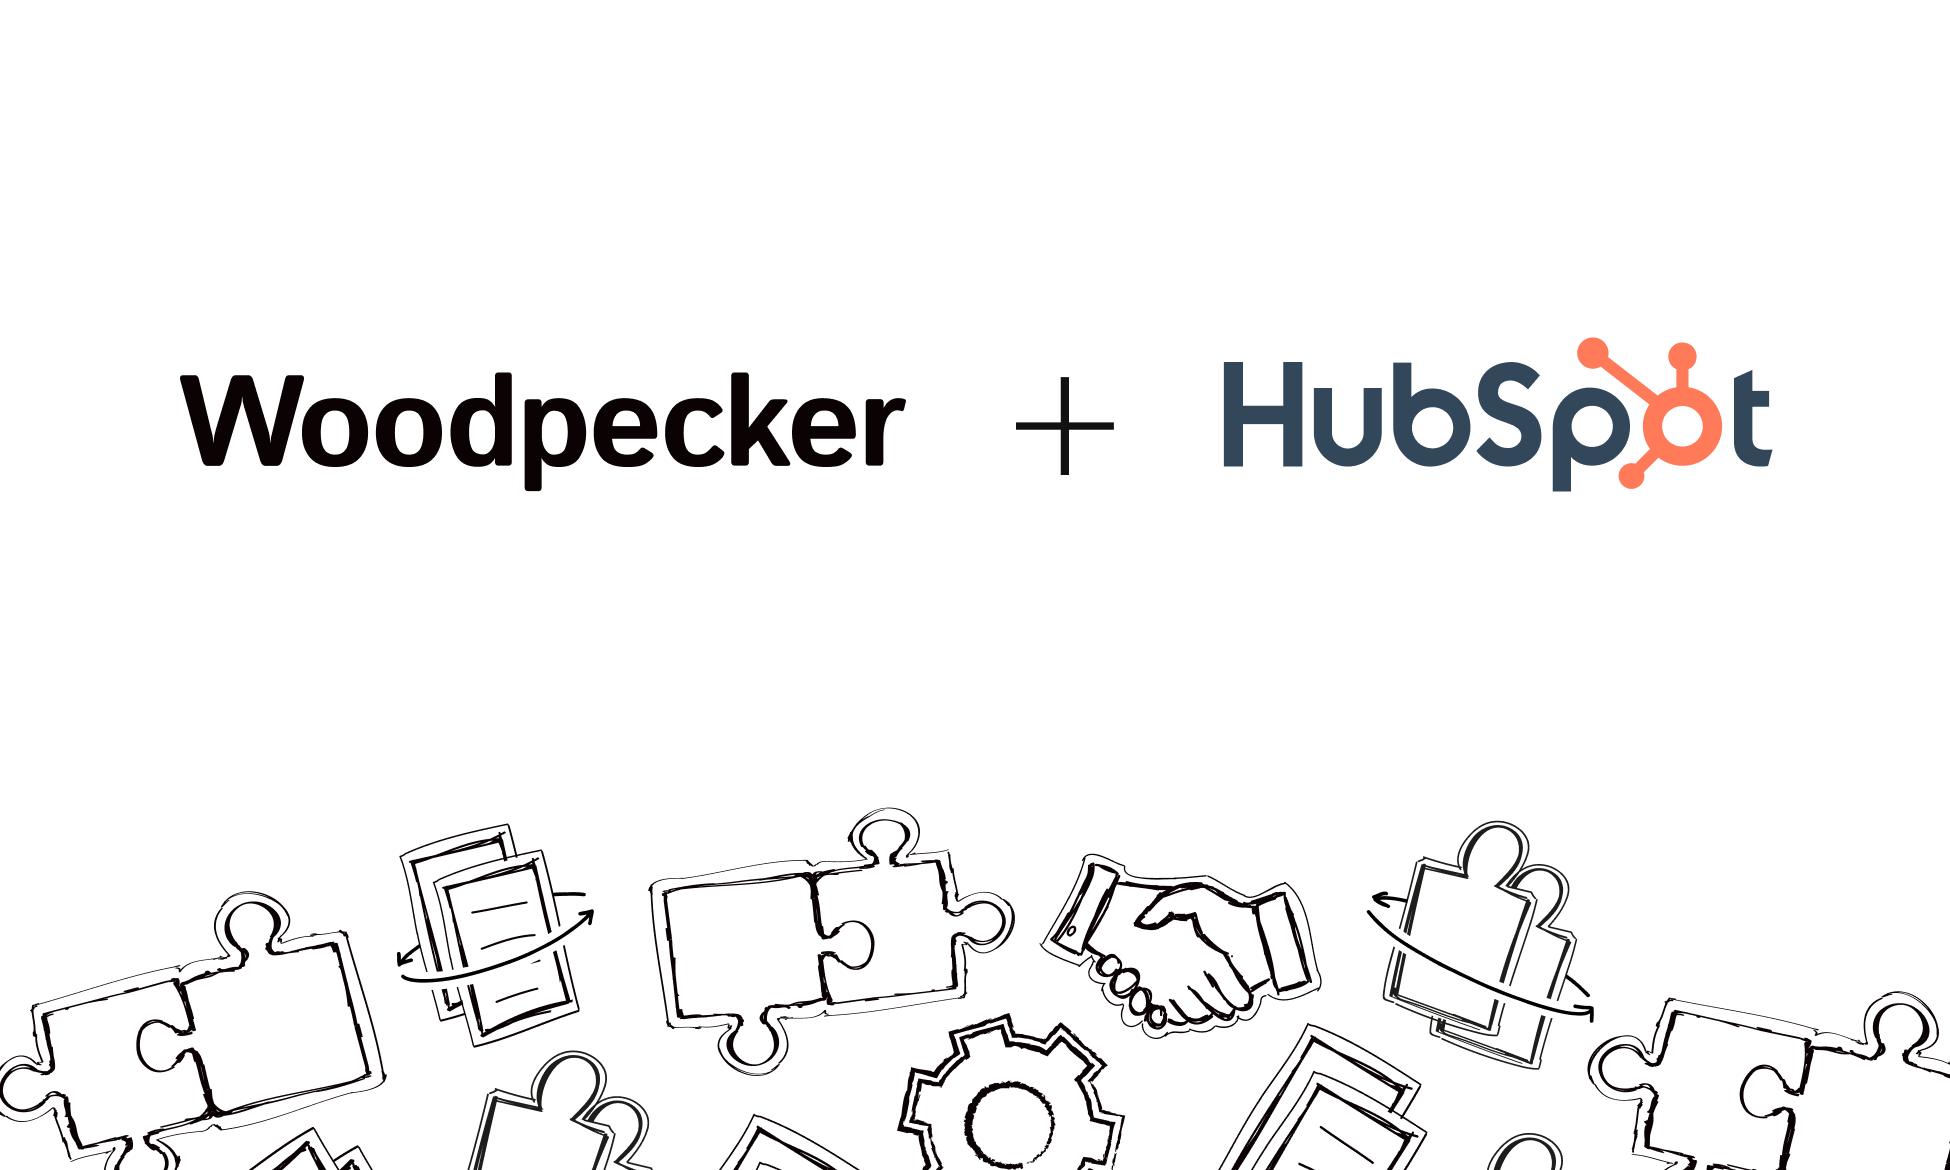 Woodpecker and HubSpot native integration